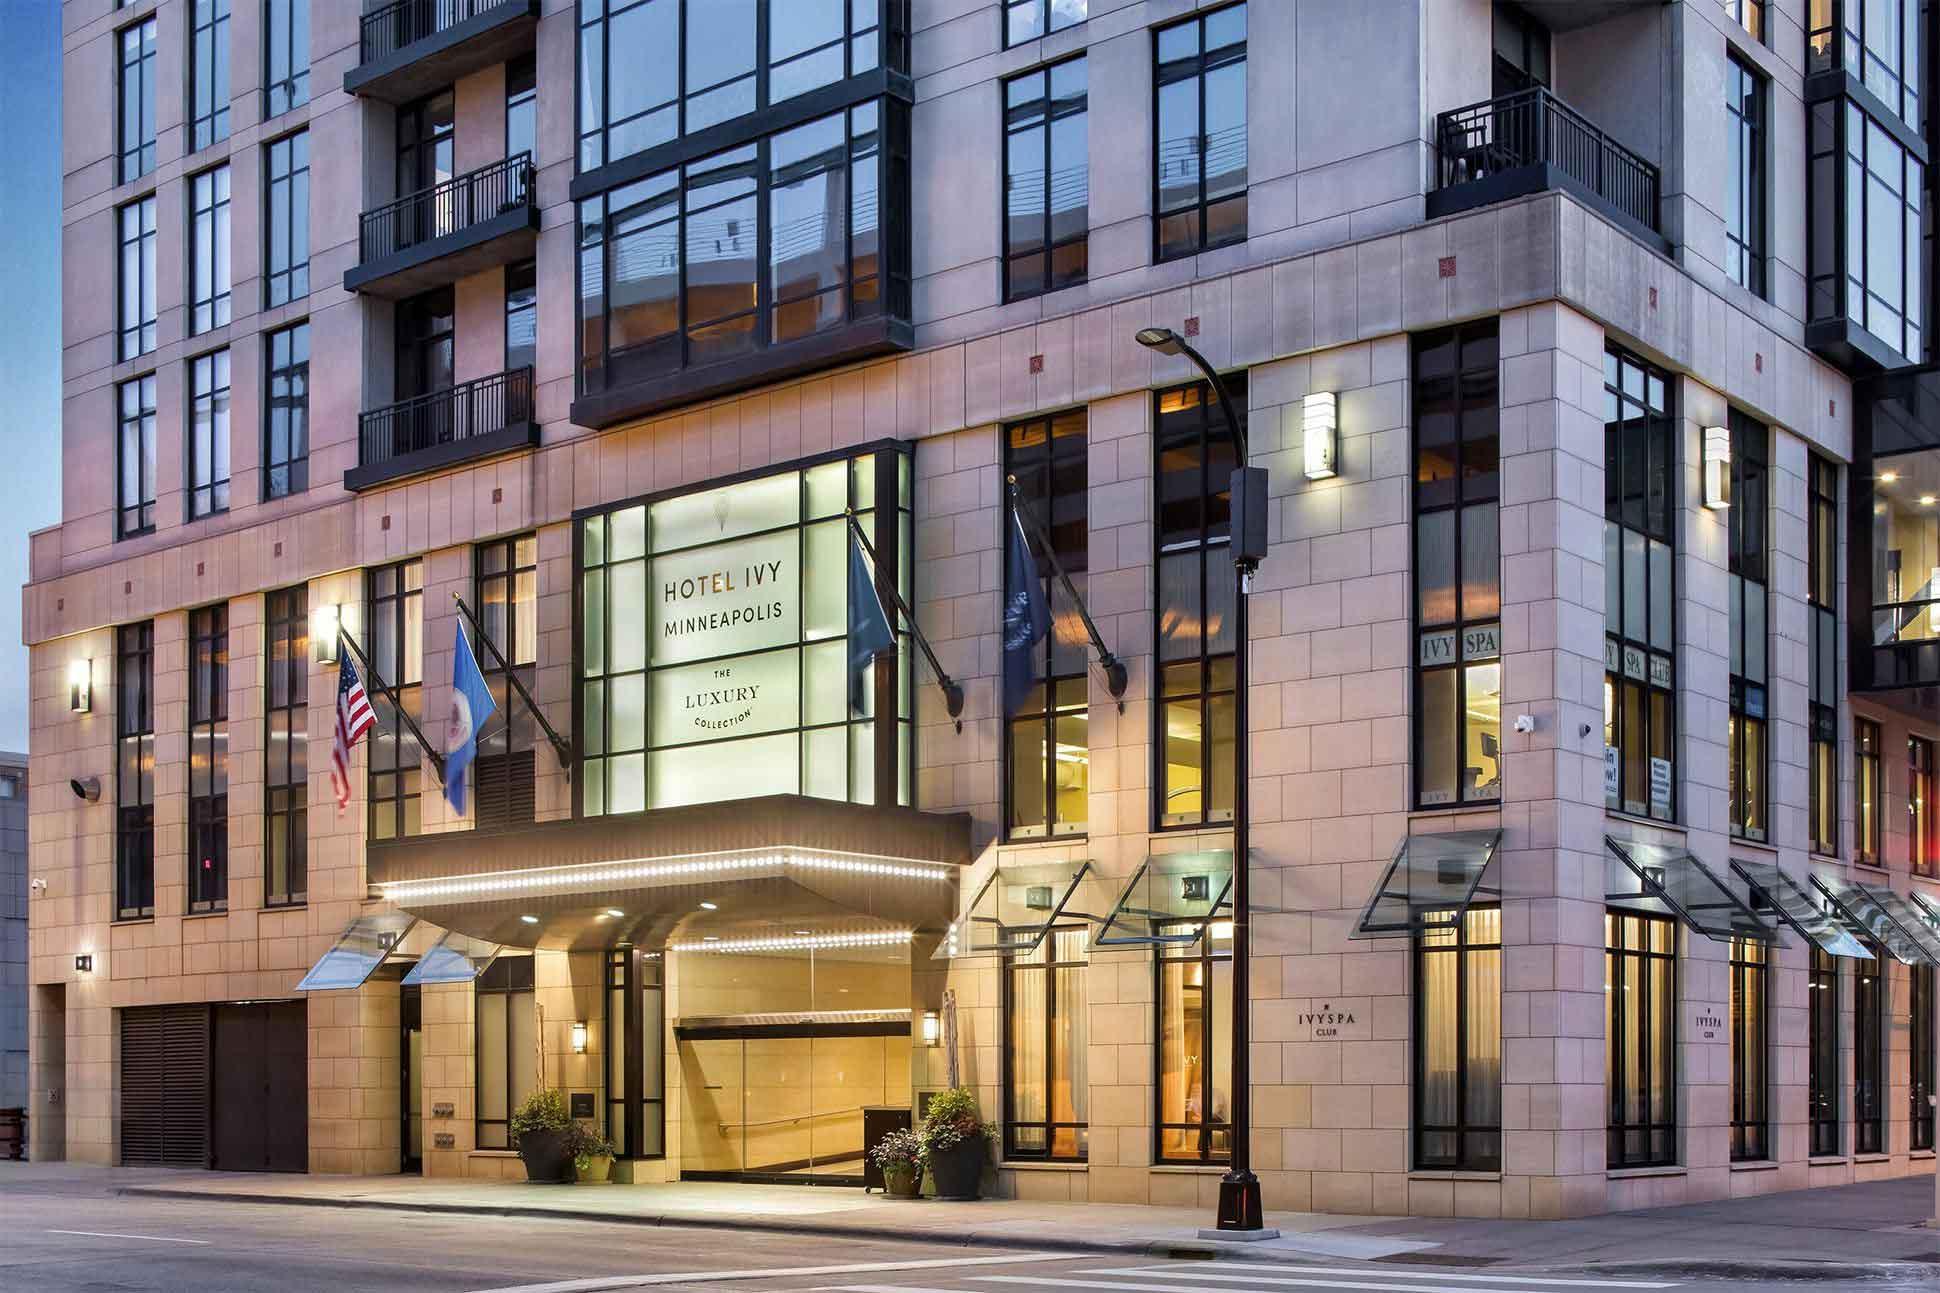 Hotel Ivy, a Luxury Collection Hotel, Minneapolis, Minnesota, USA